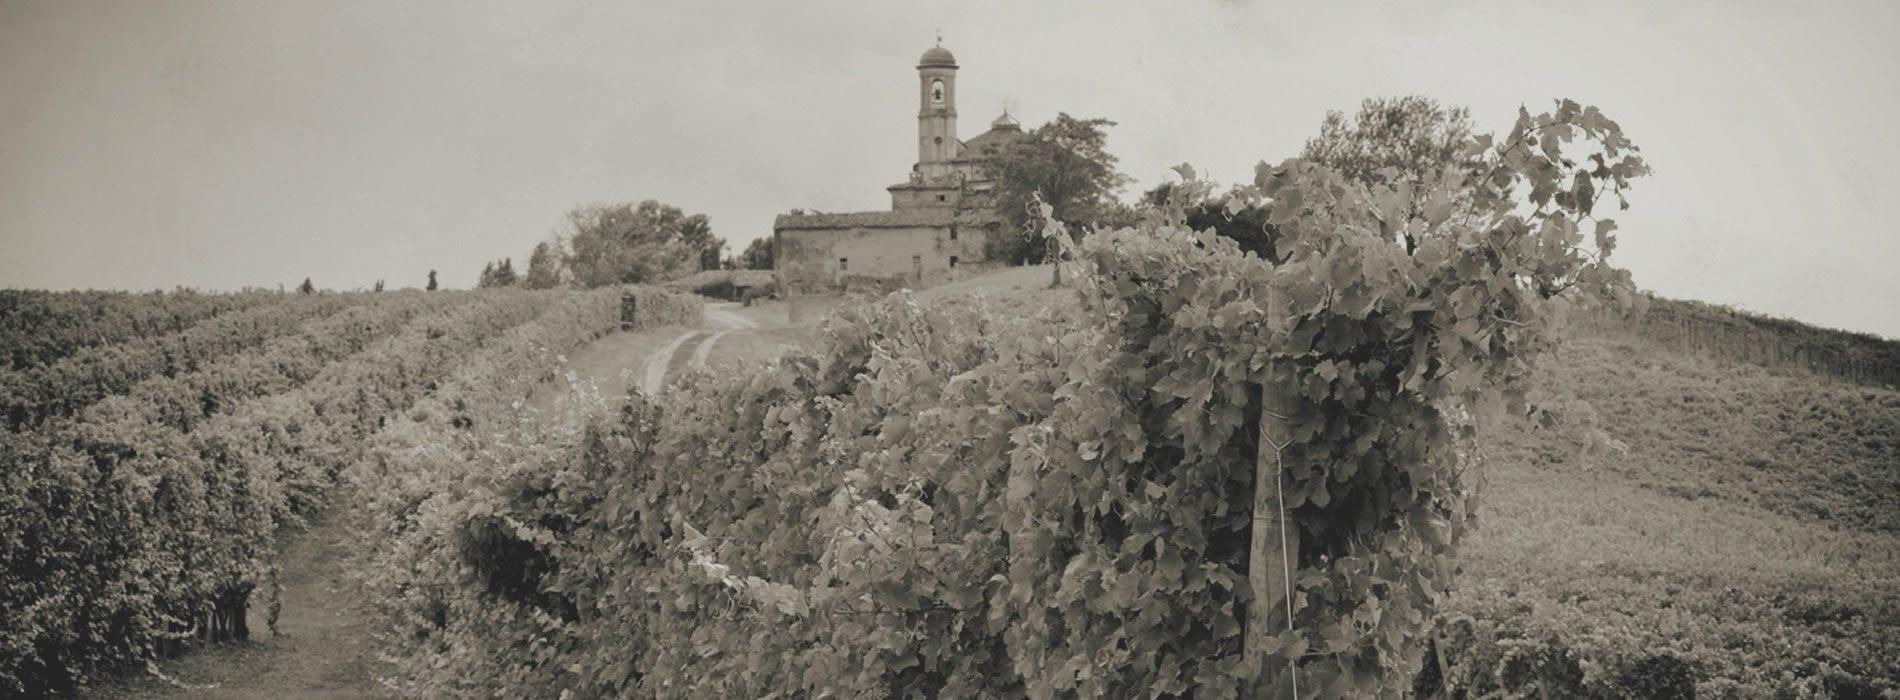 foto storica vitigni nelle slide